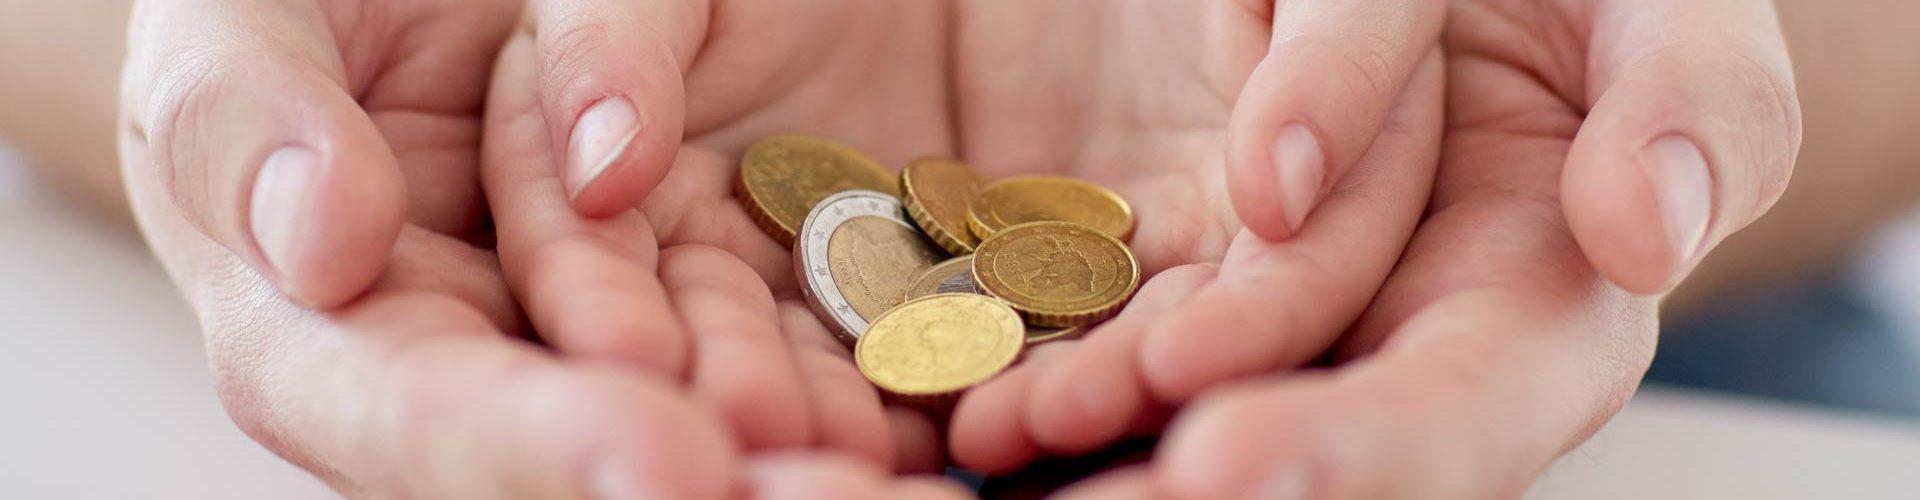 maintenance-payments-ireland